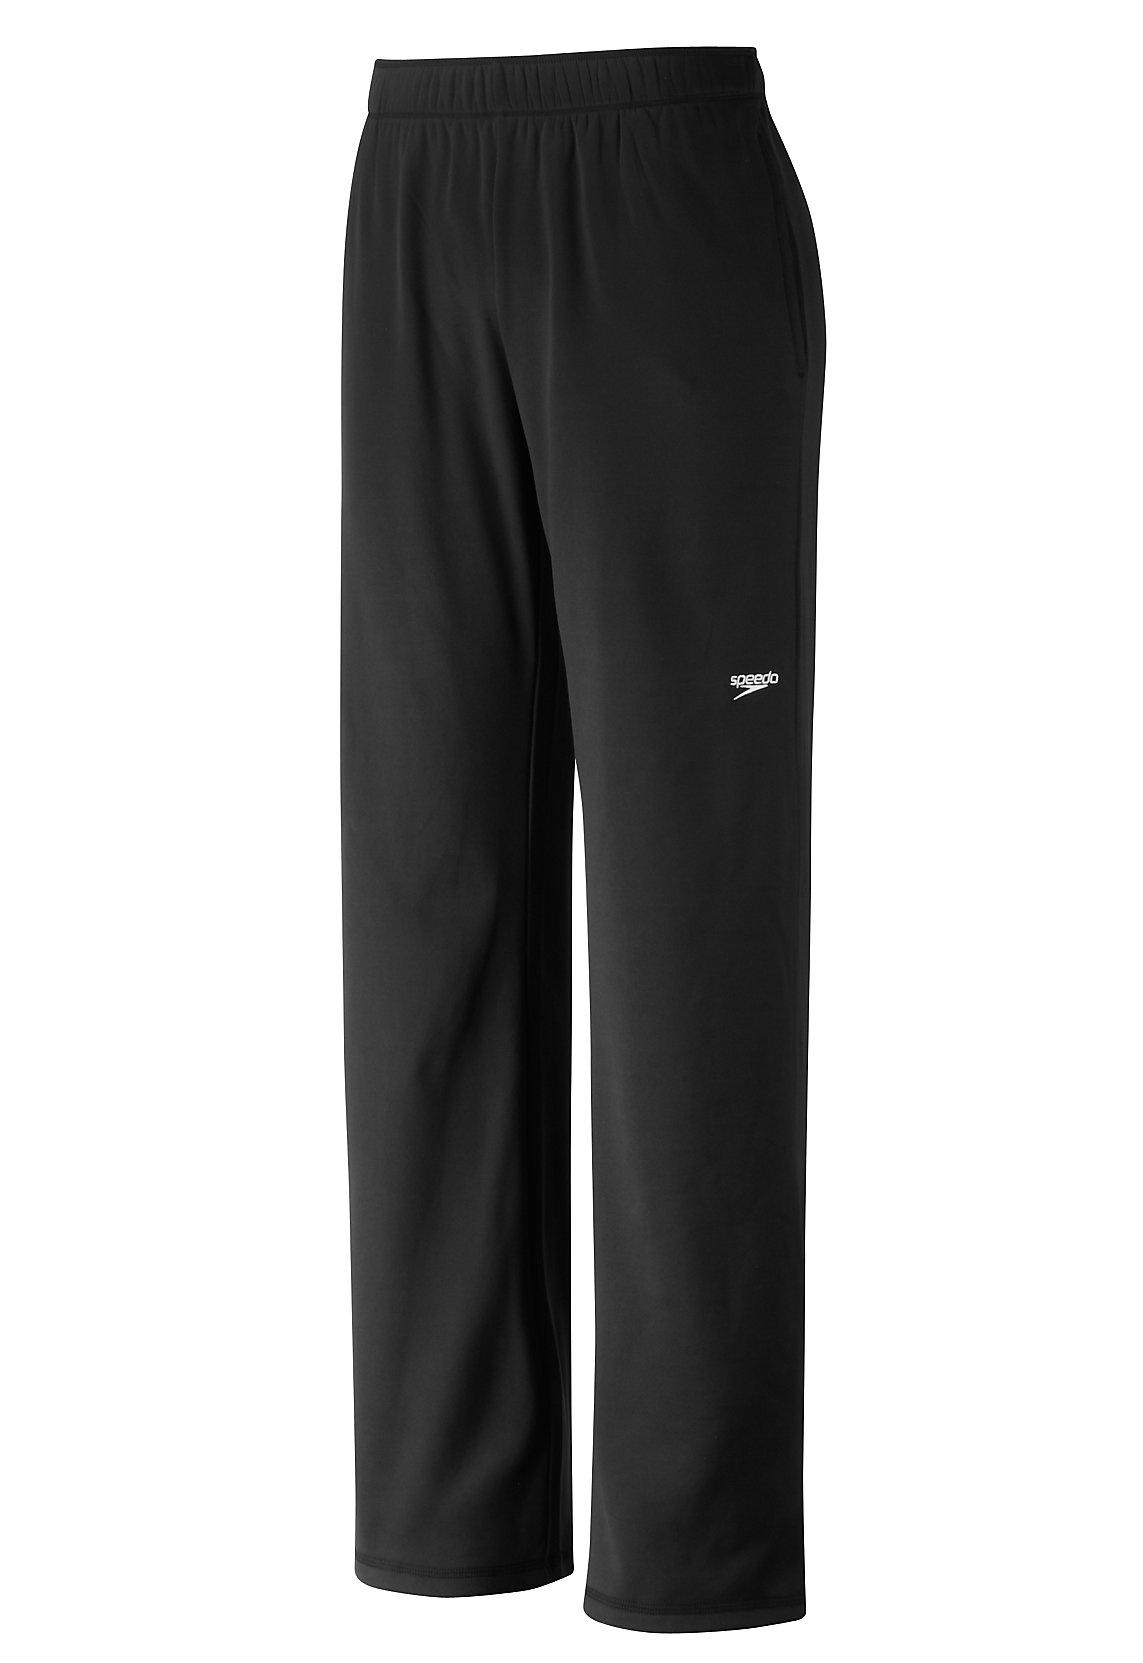 Speedo Youth Streamline Warm Up Pant - Unisex Speedo Black Small